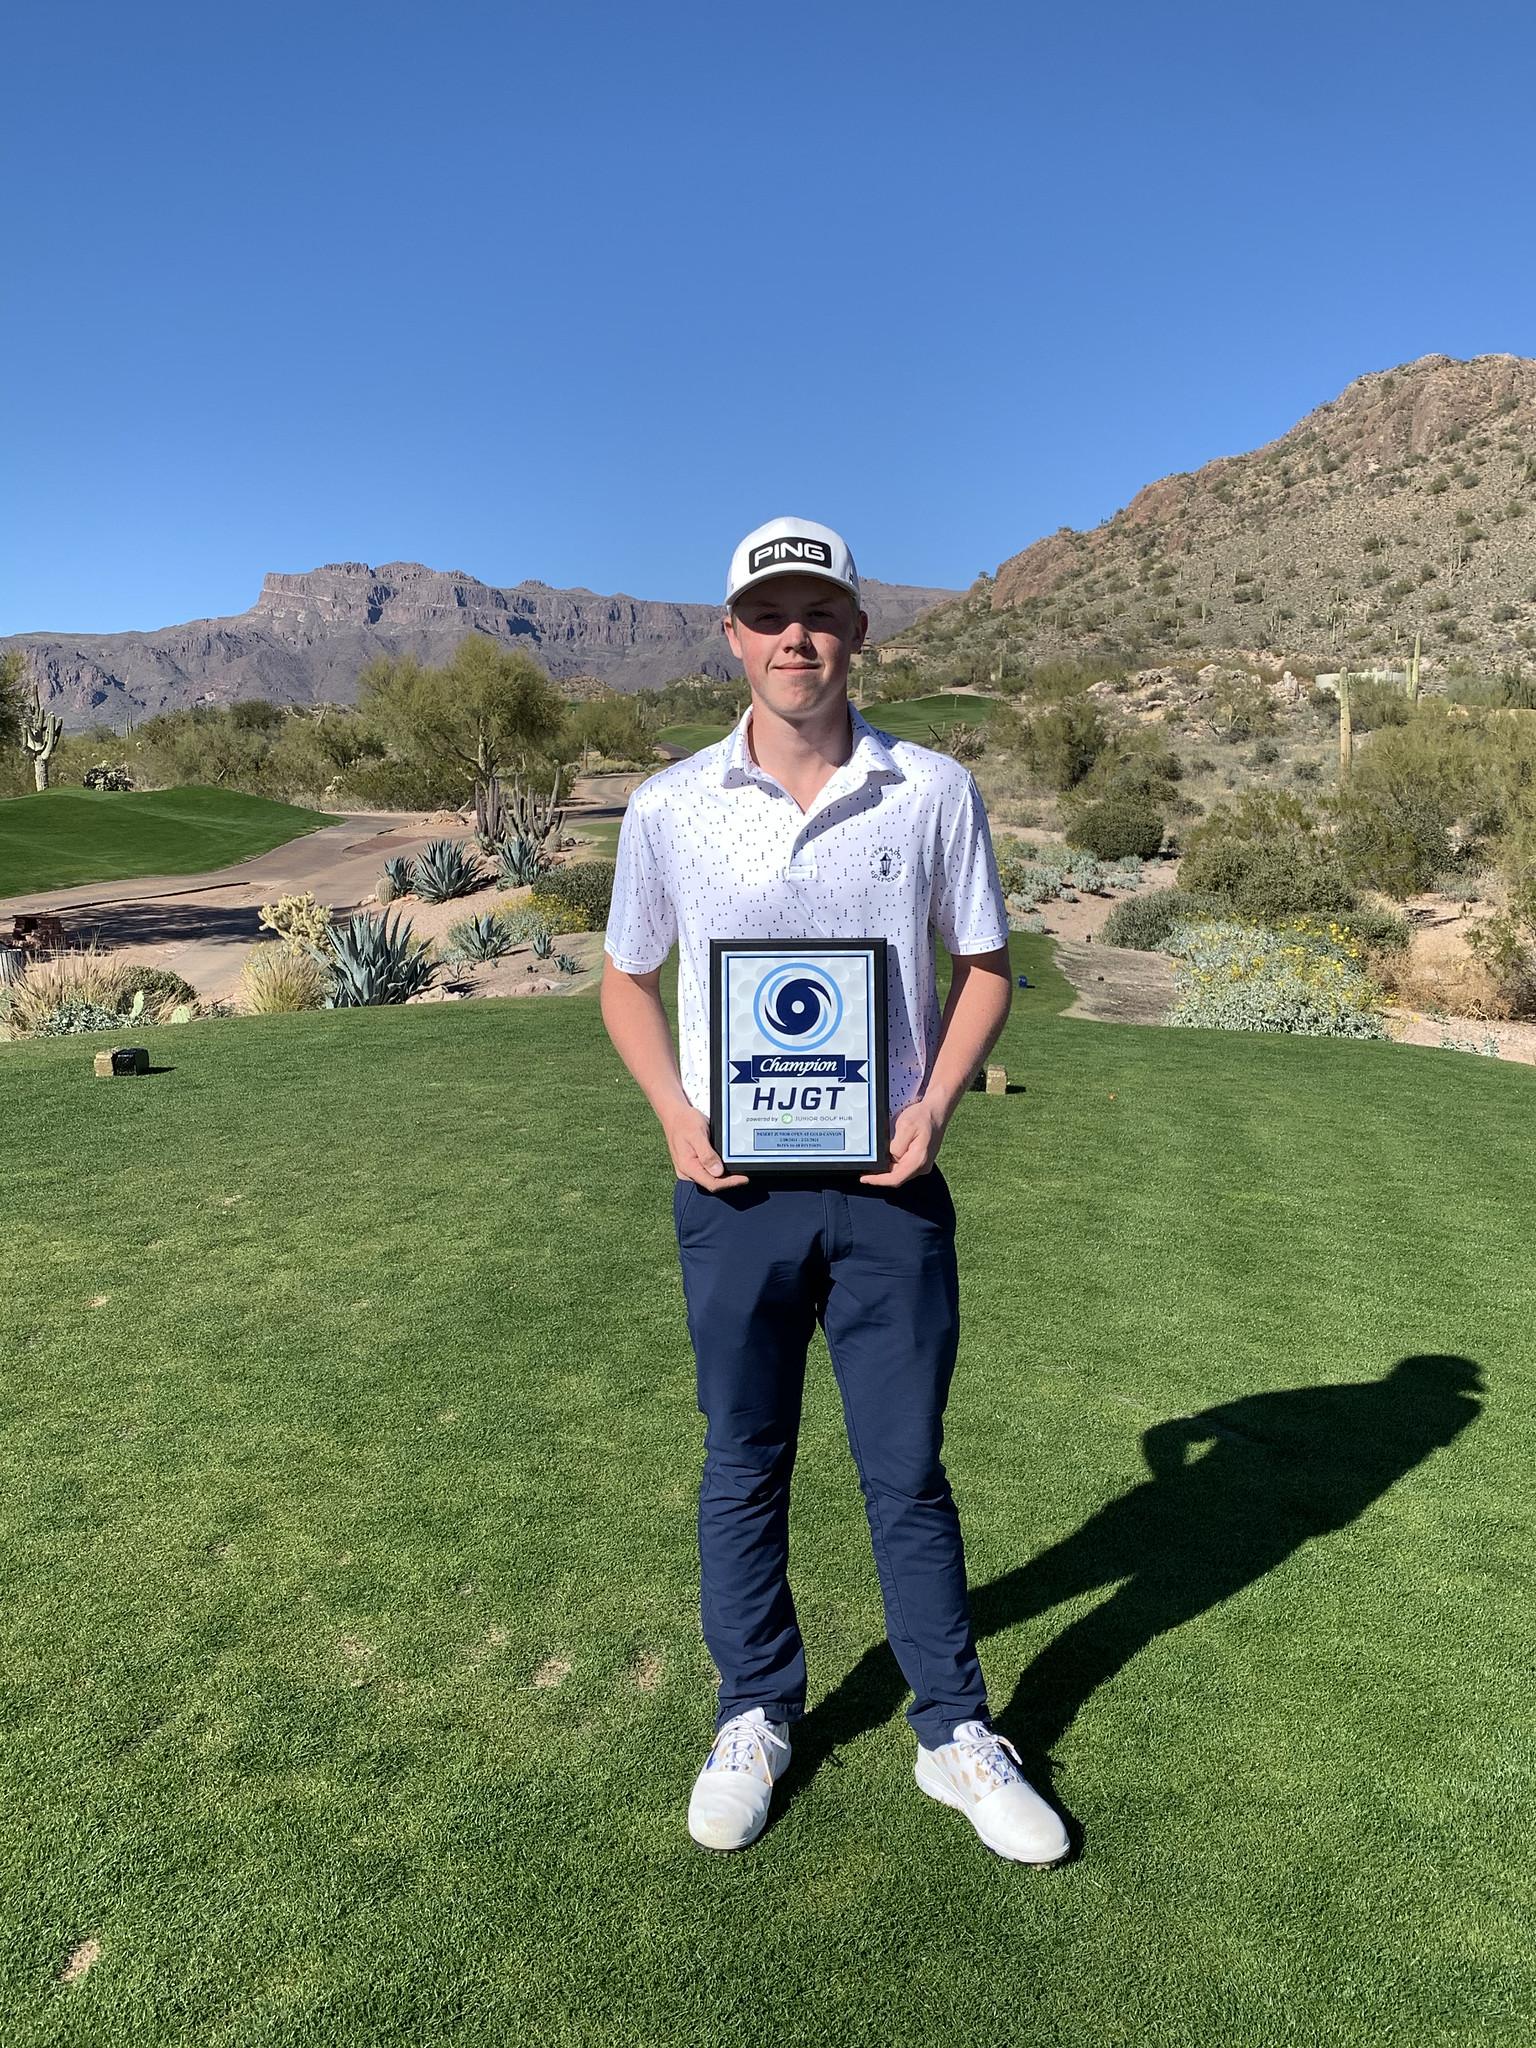 Desert Junior Open at Gold Canynon